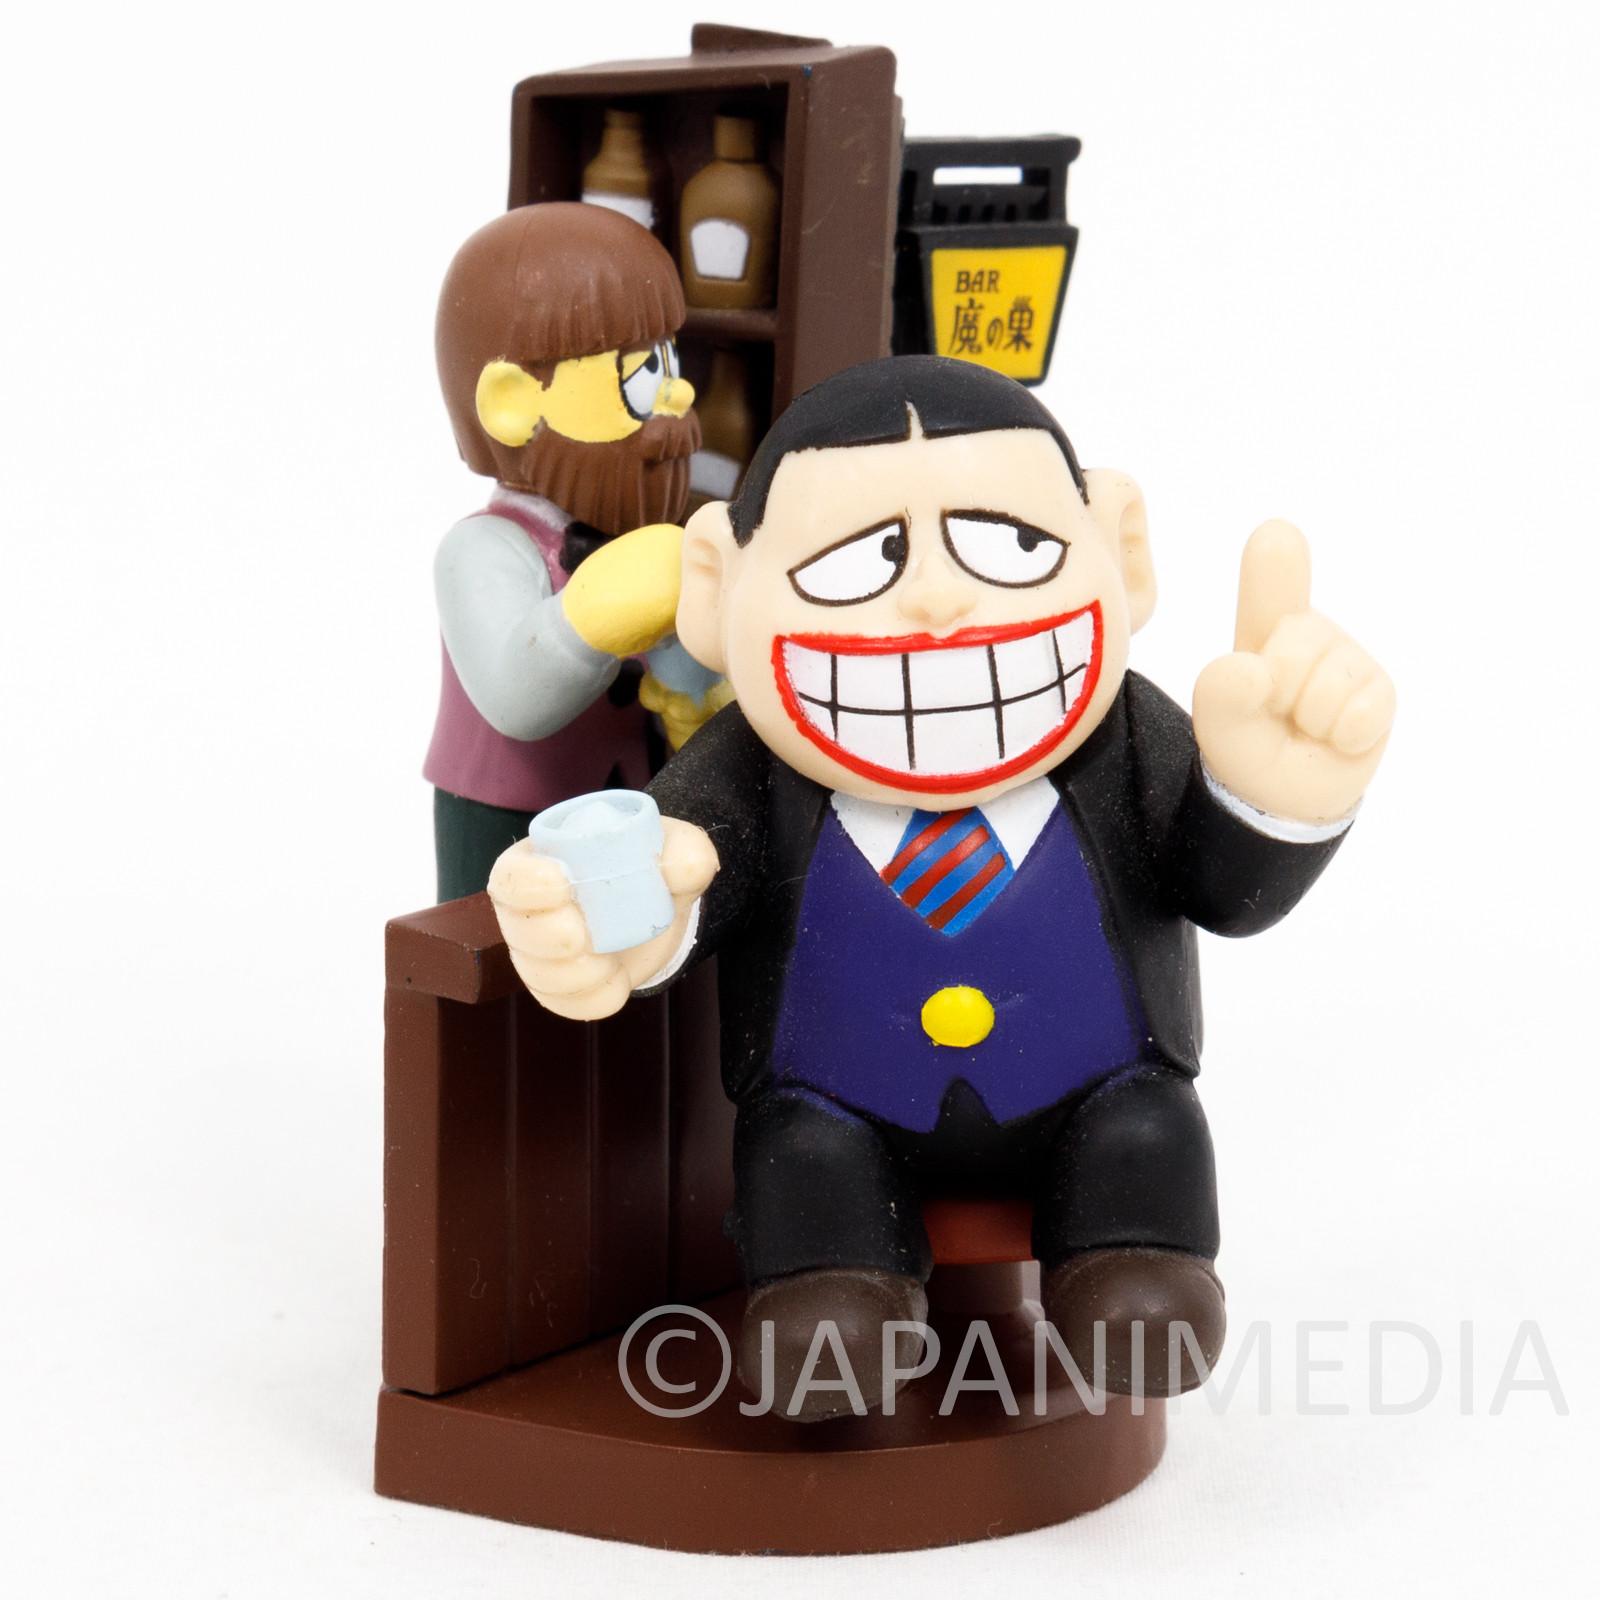 Warau Laughing Salesman Diorama Miniature Figure JAPAN ANIME